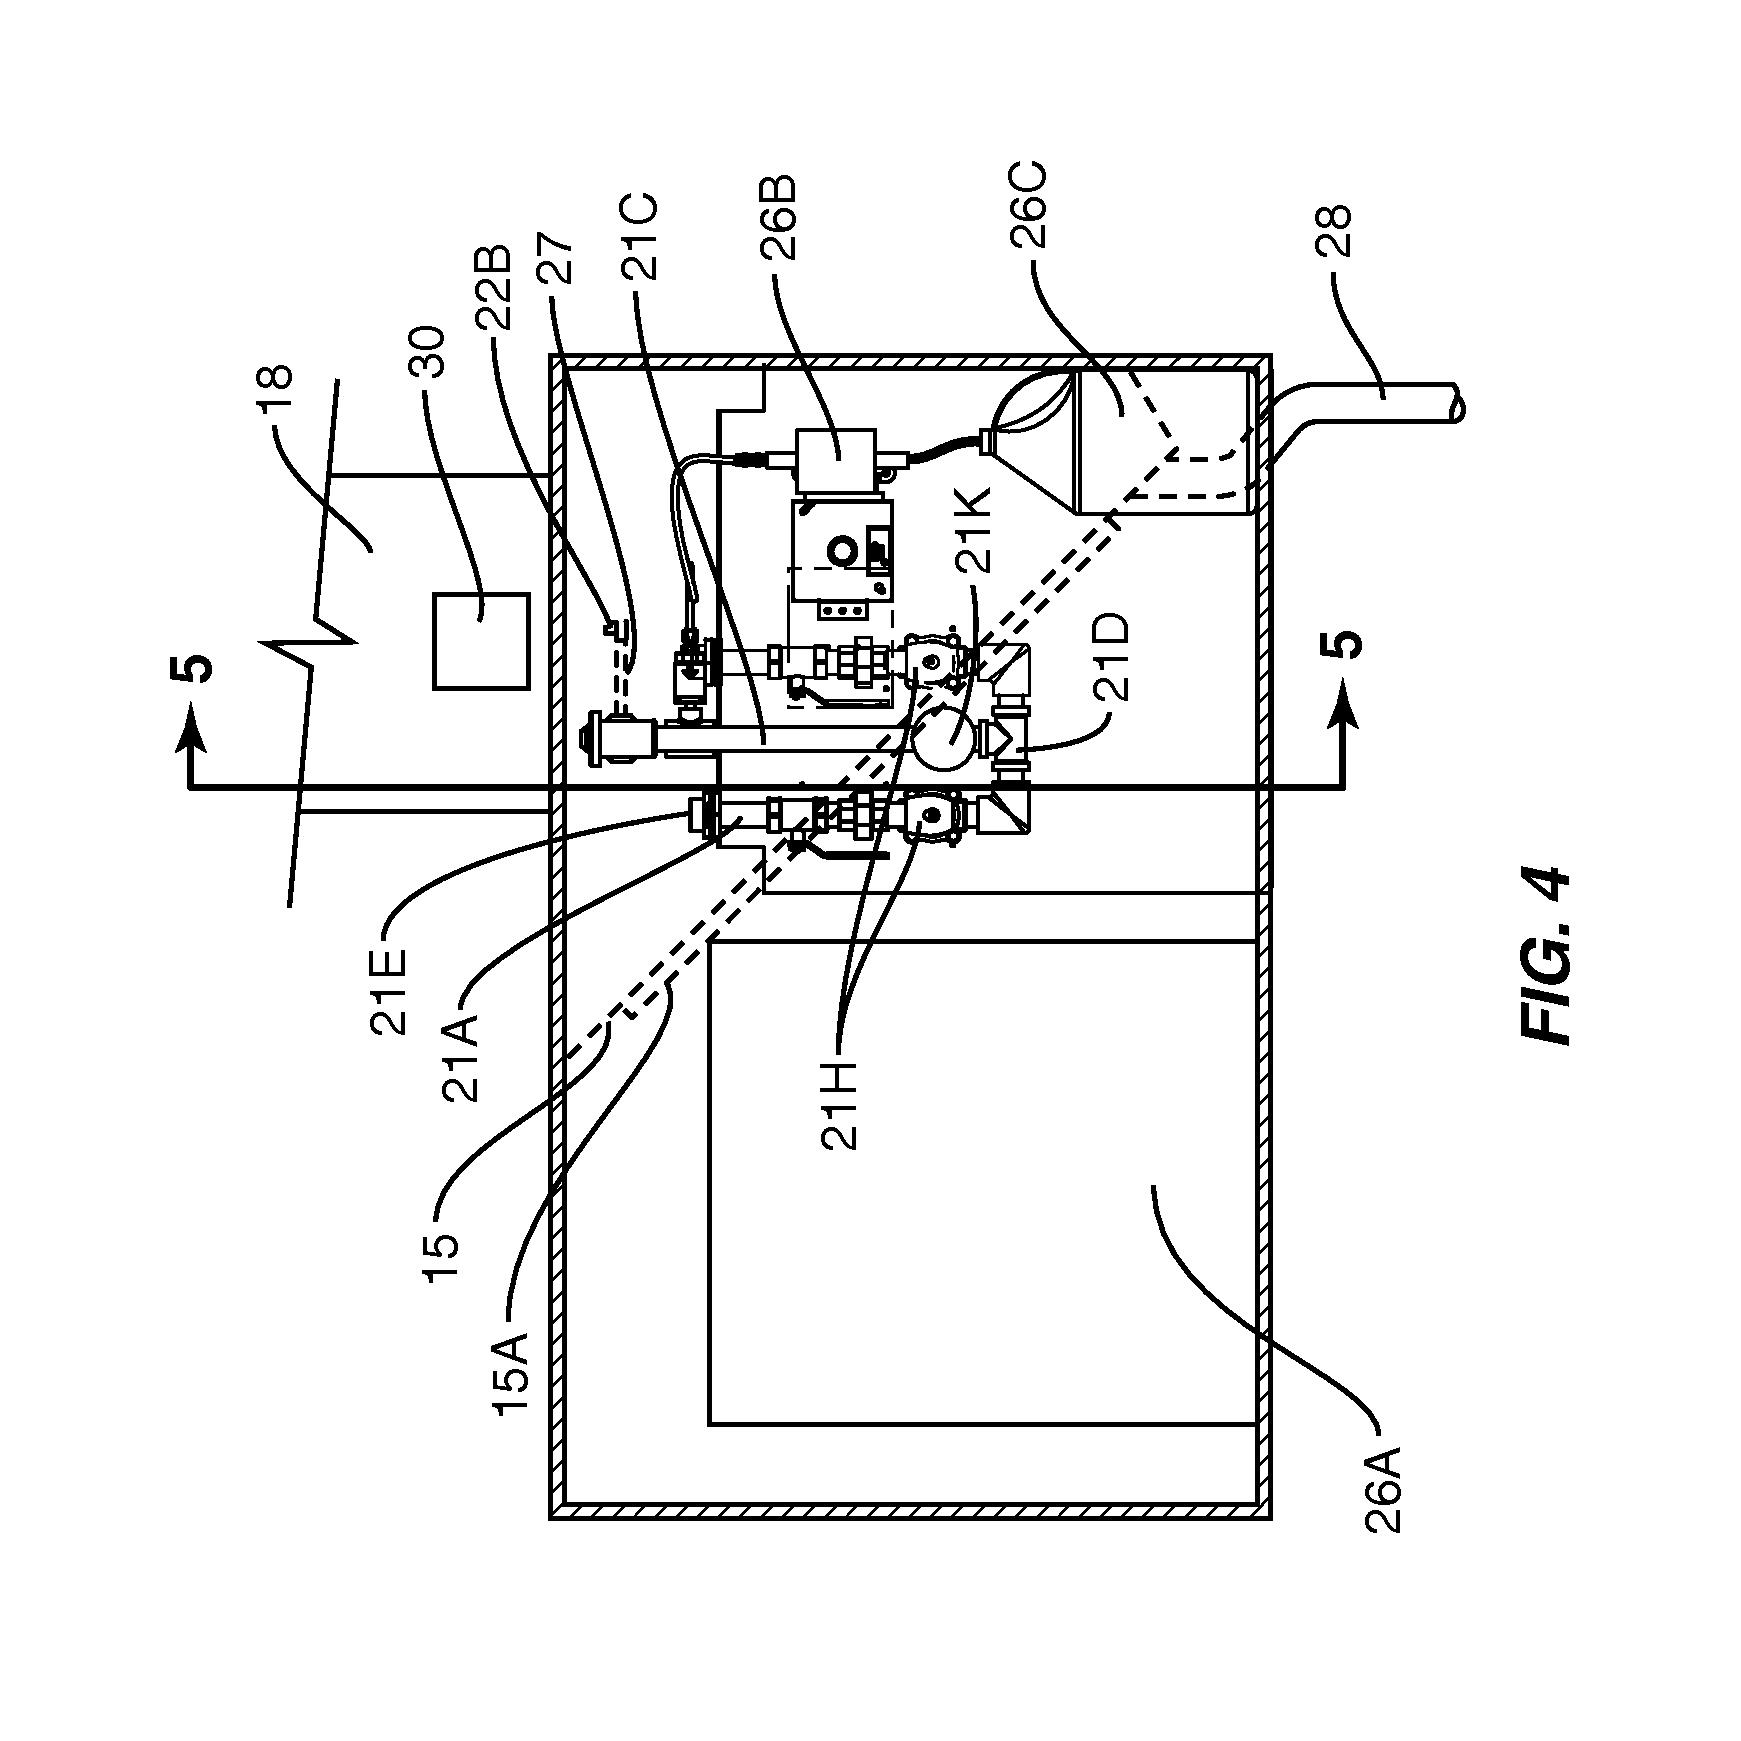 Ansul System Wiring Diagram - Lorestan - Ansul System Wiring Diagram